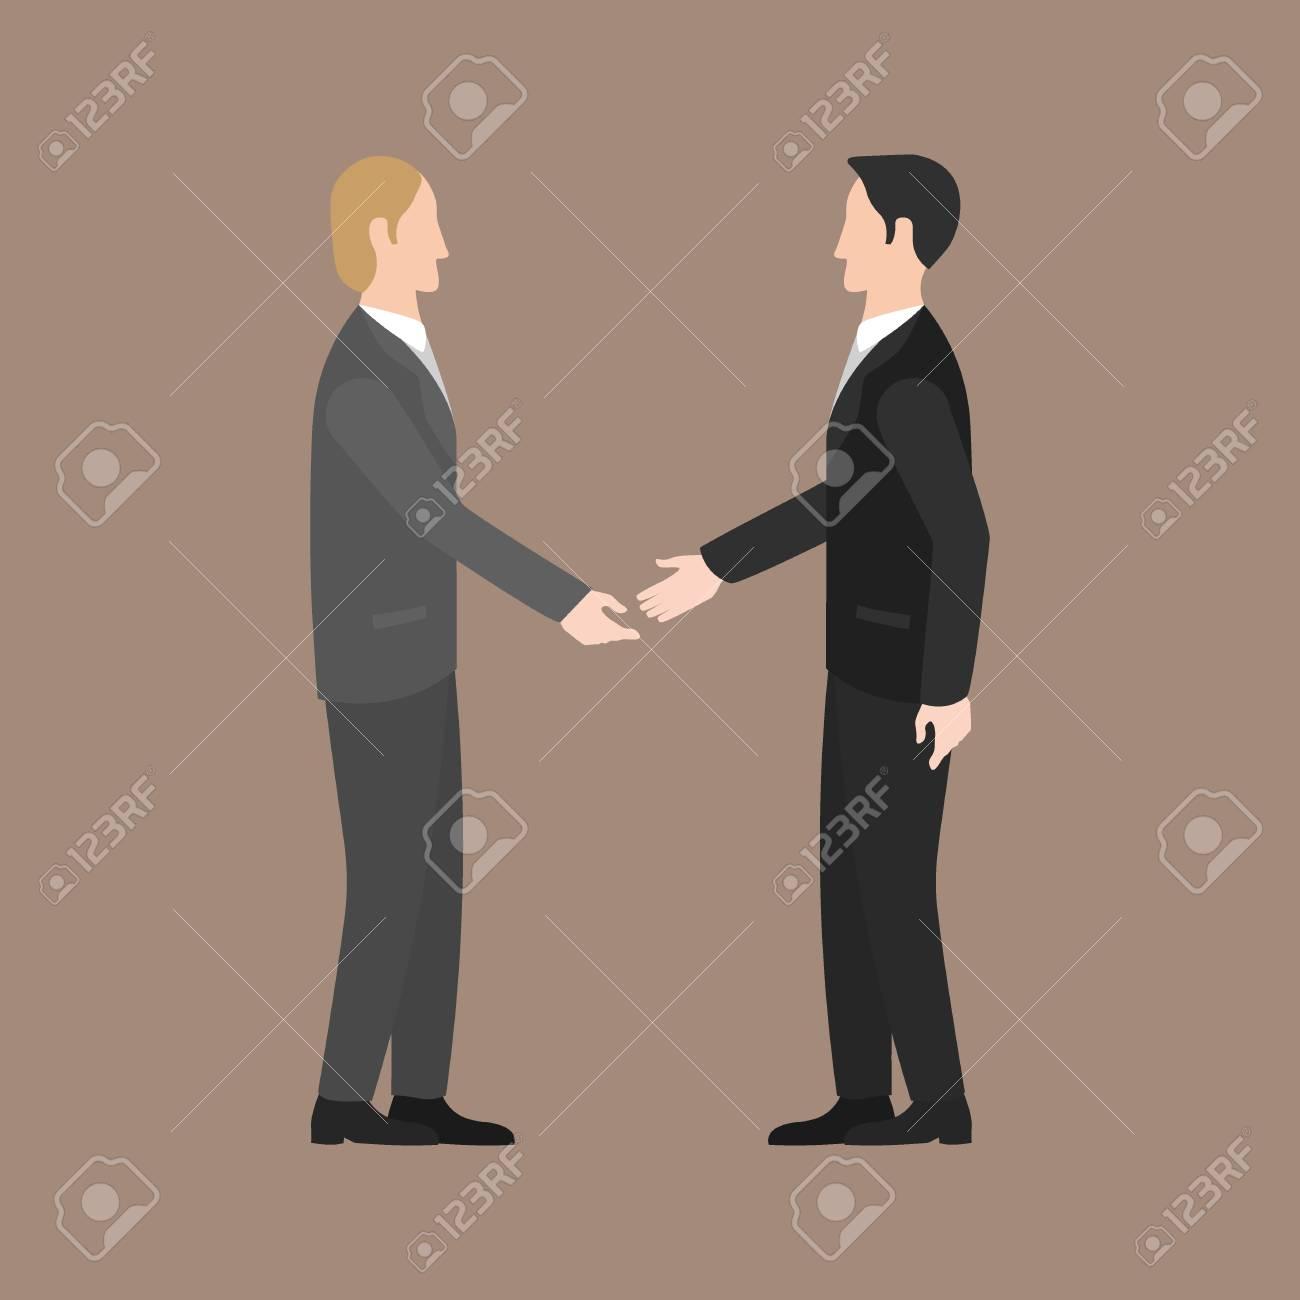 Businessman shaking hands - 44331328